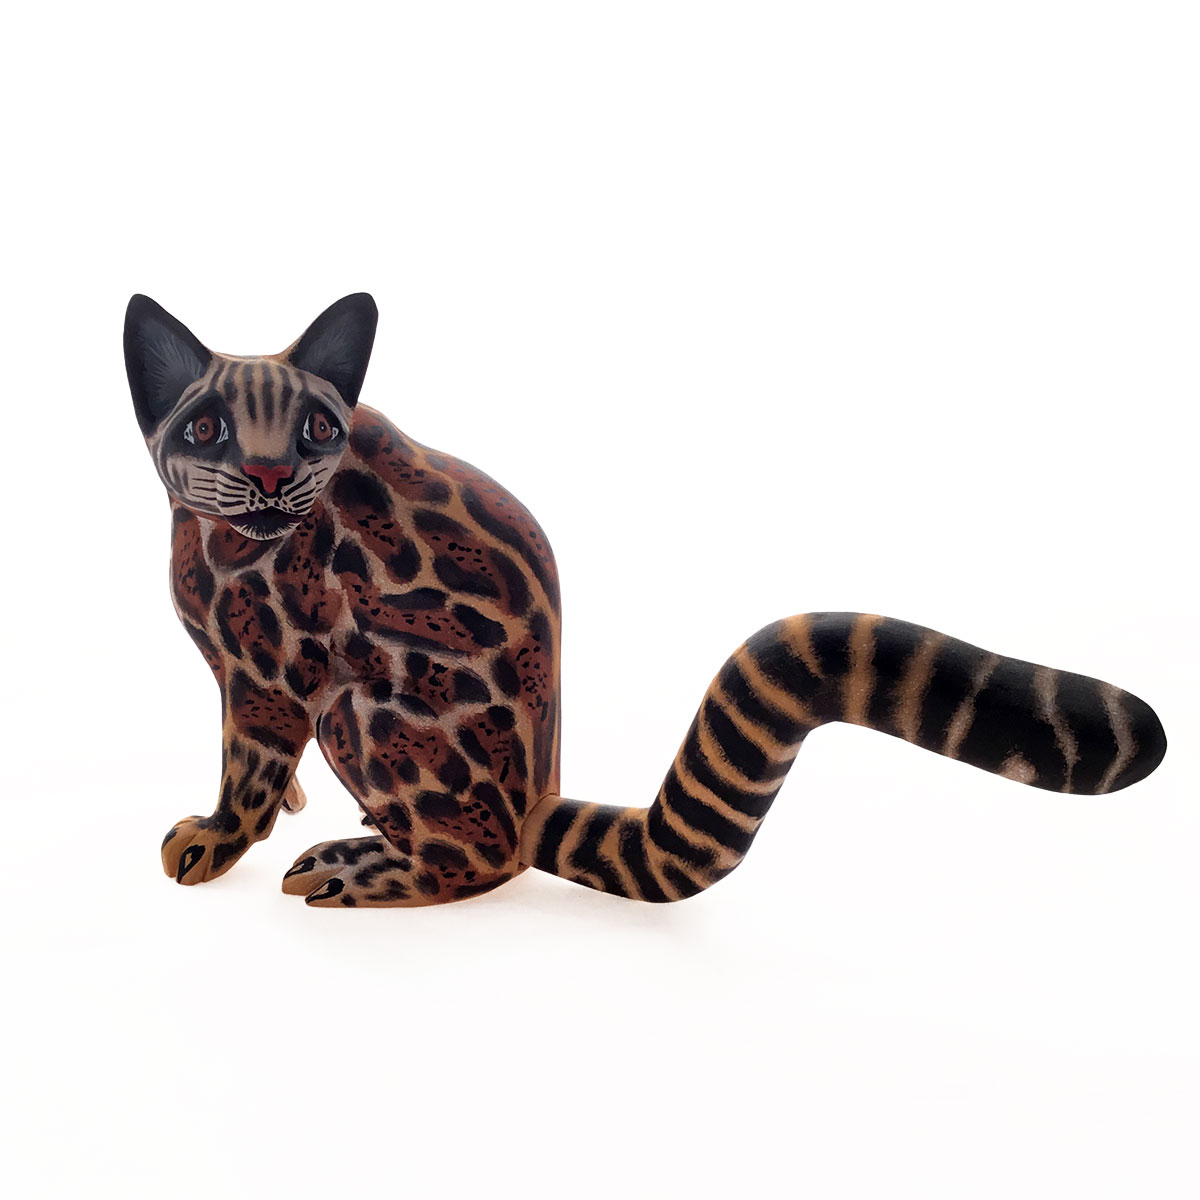 Eleazar Morales Eleazar Morales: Ocelot Cats